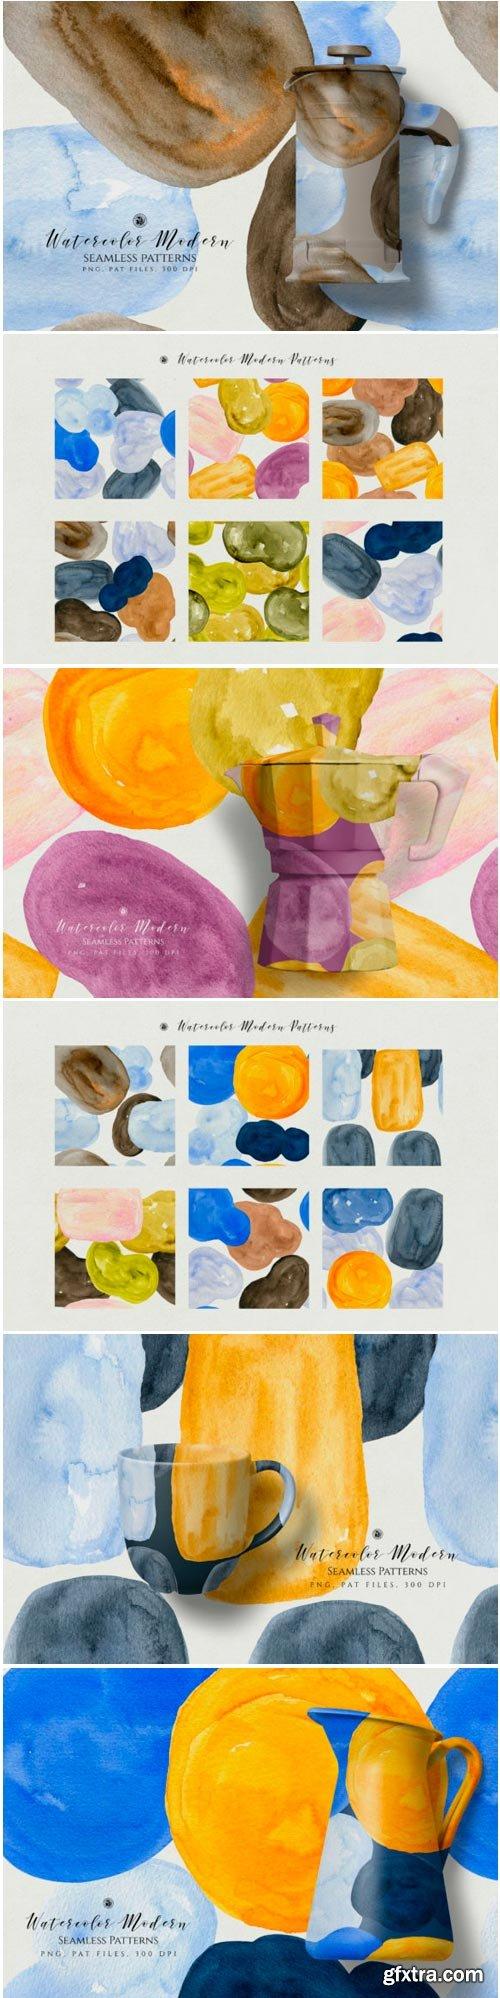 Watercolor Modern Patterns 1424644